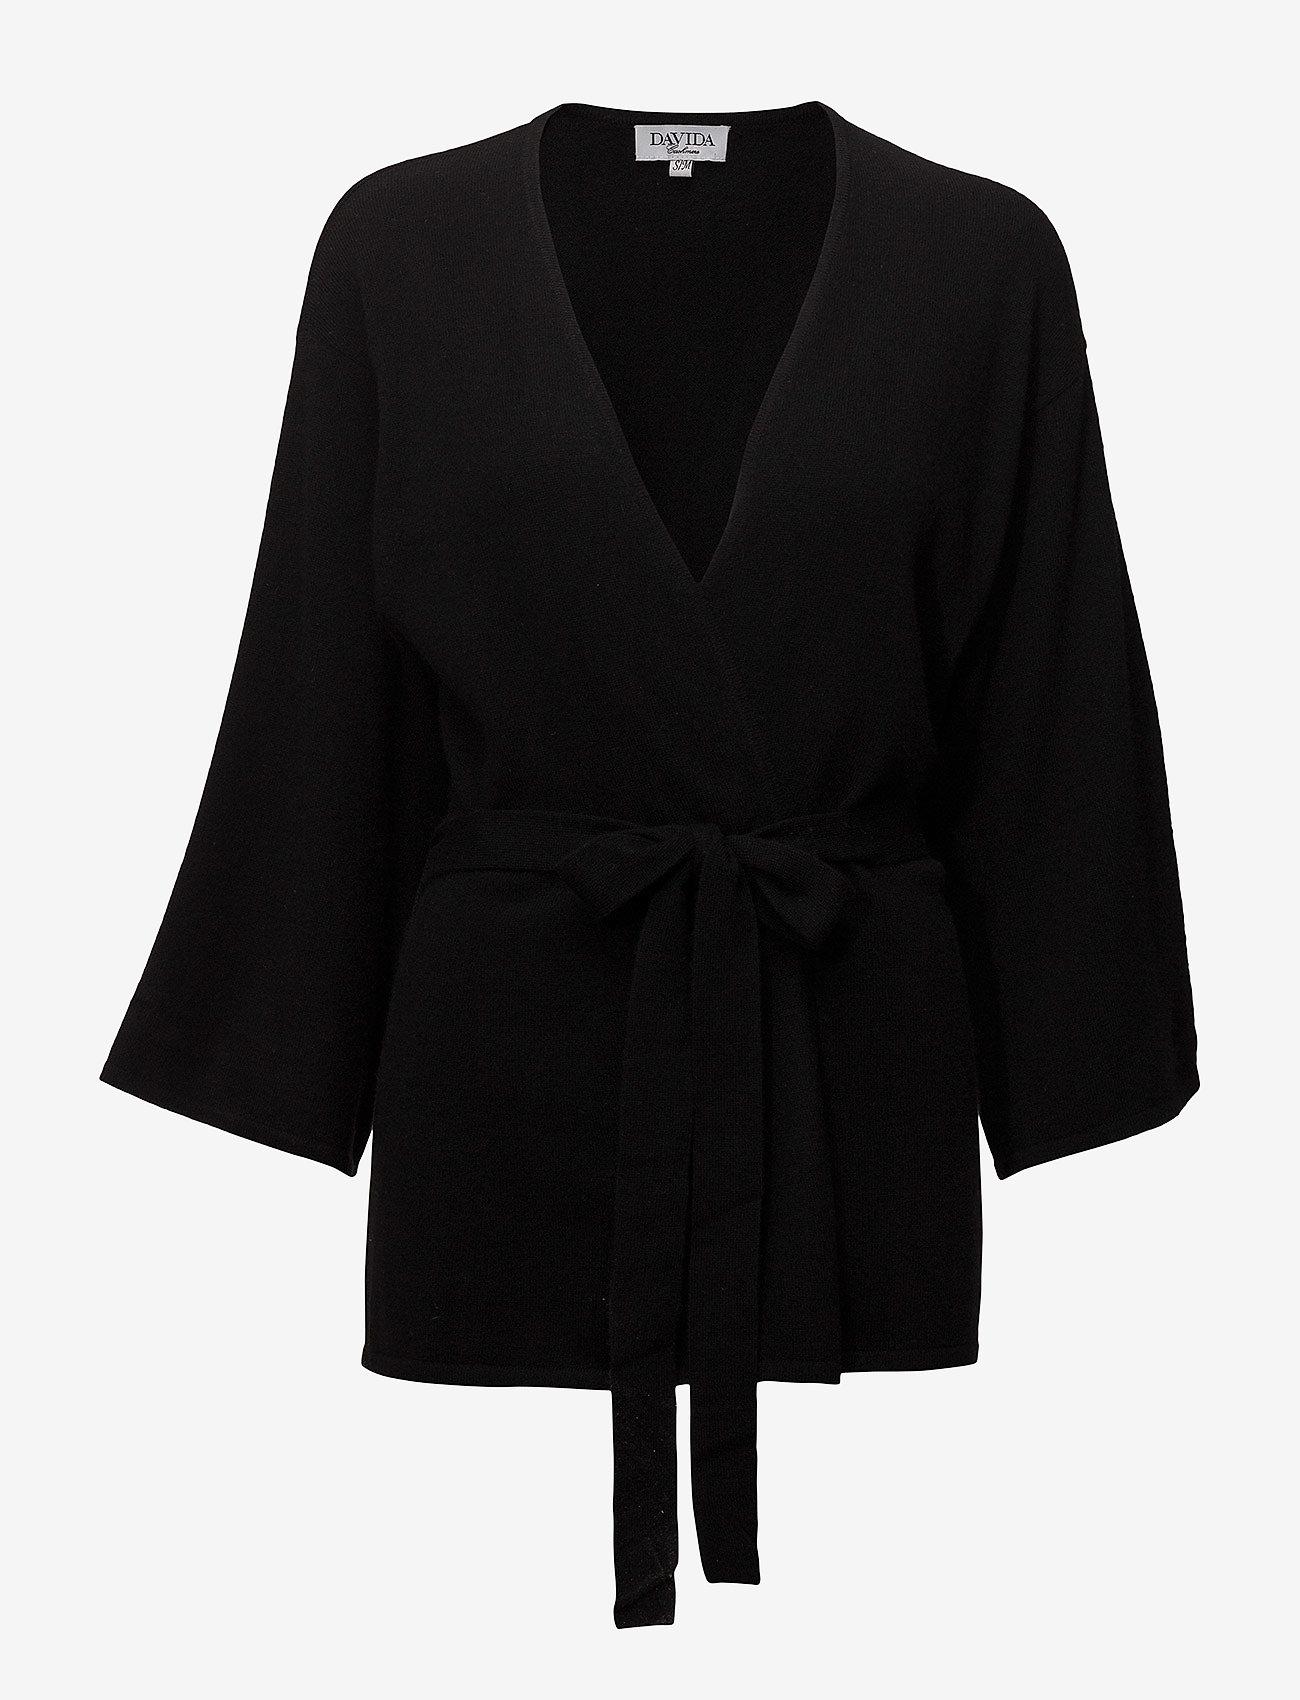 Davida Cashmere - Kimono - cardigans - black - 1